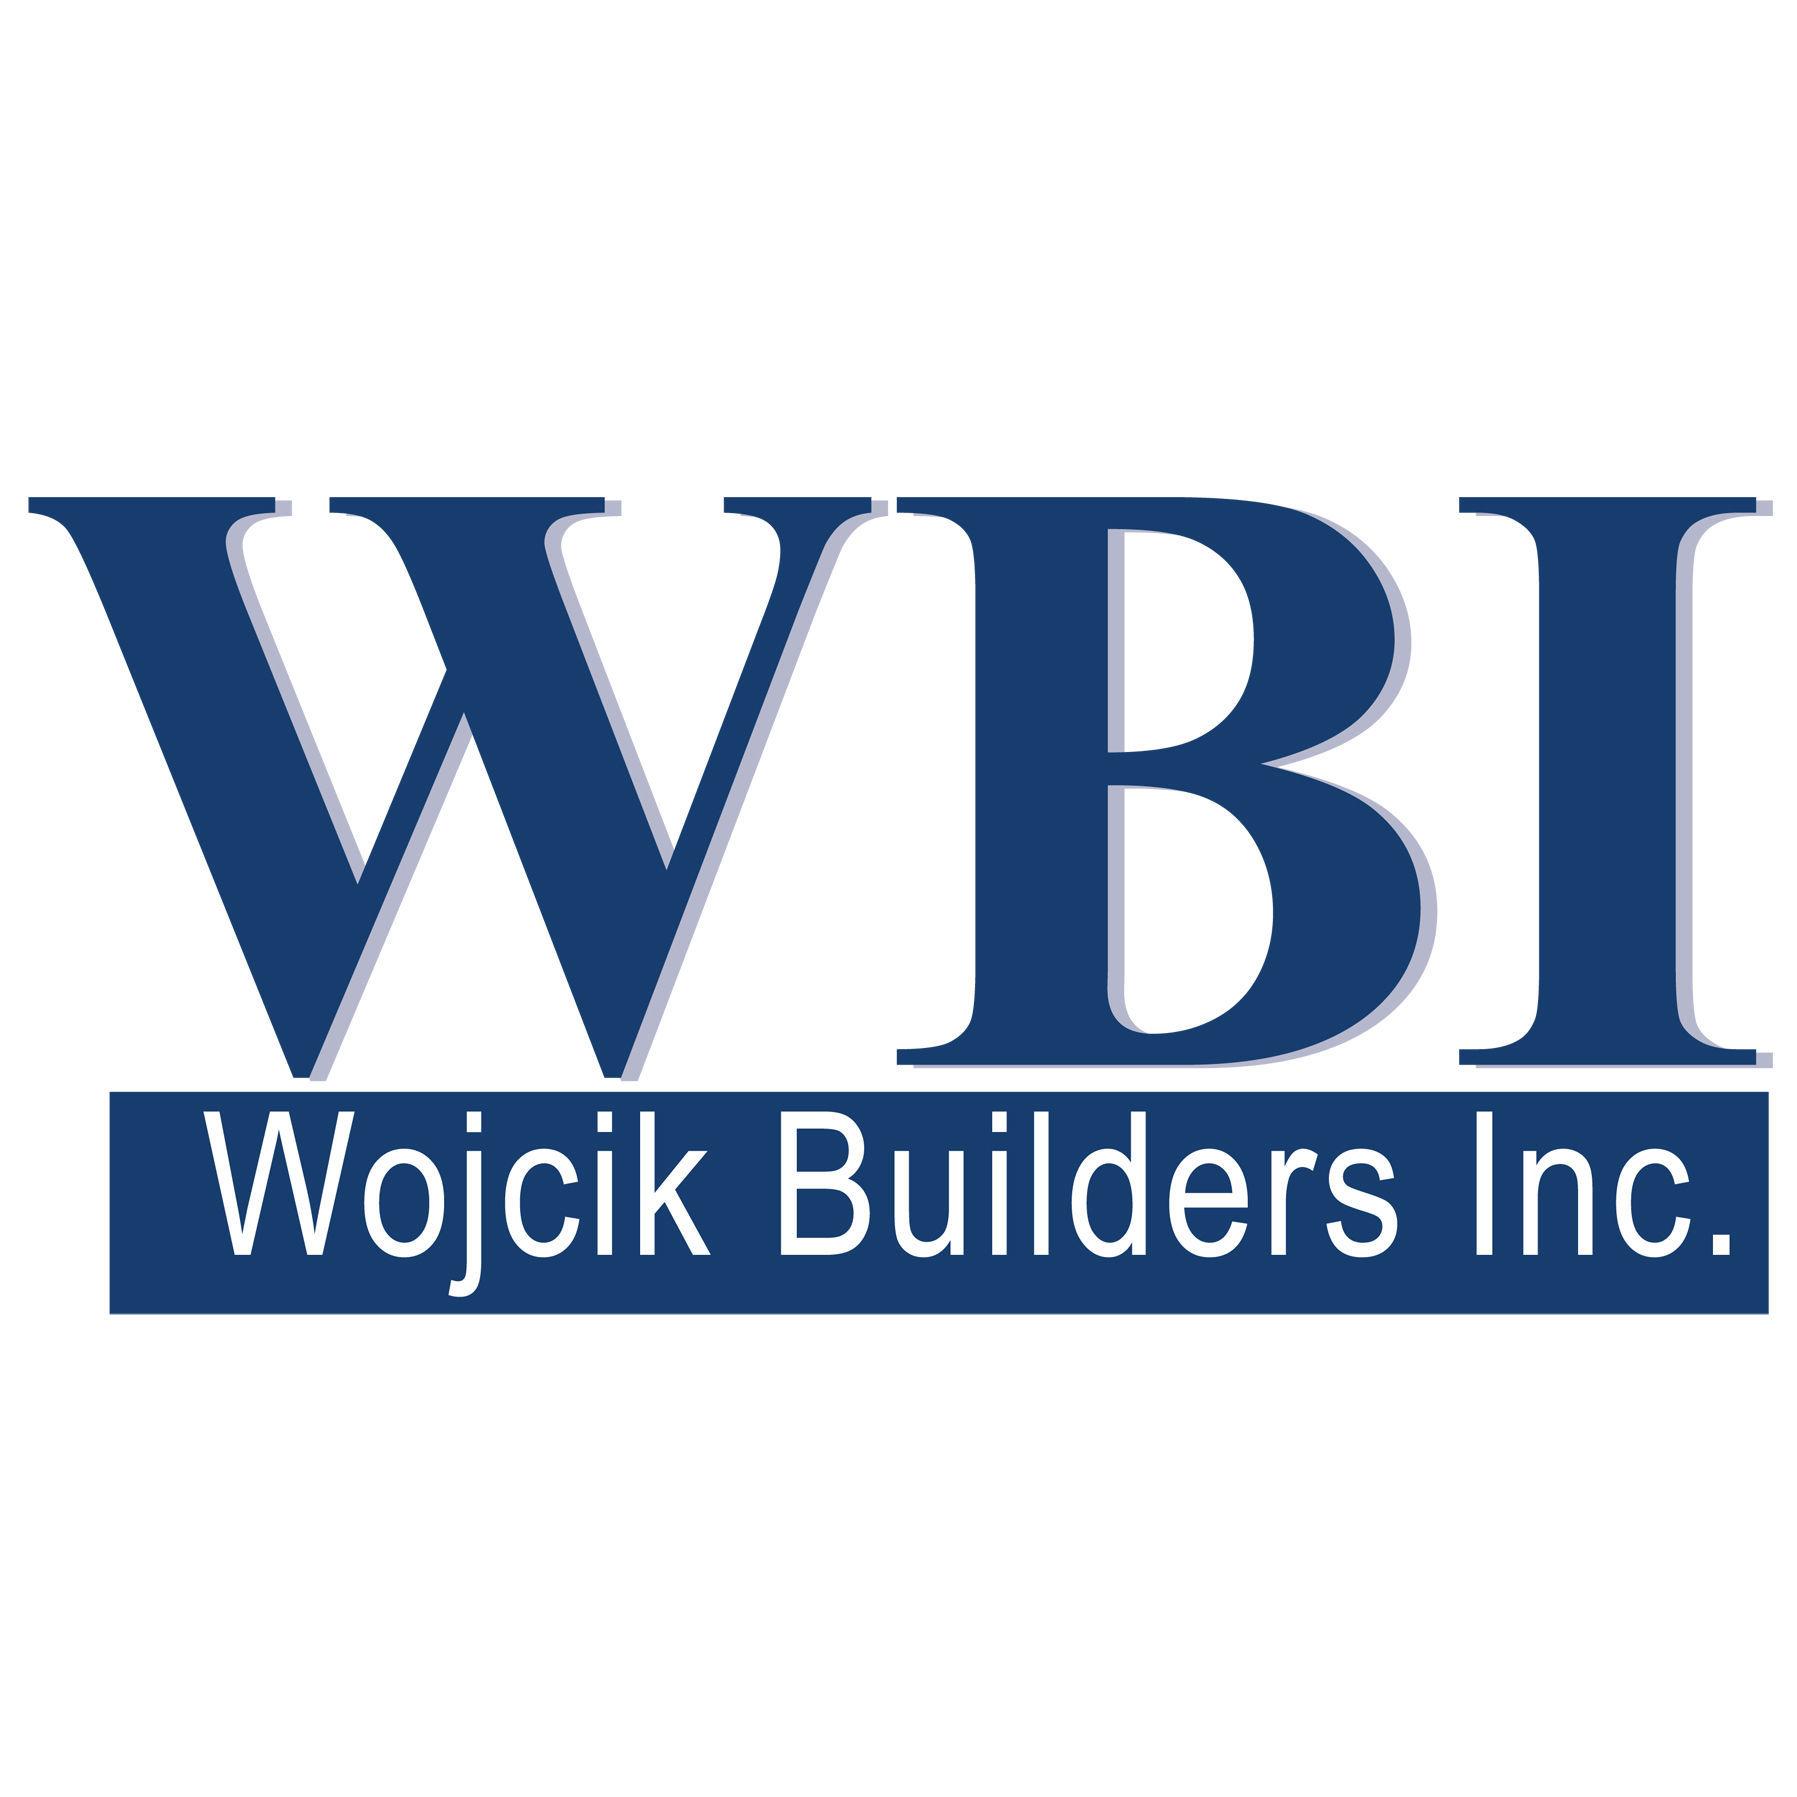 Wojcik Builders, Inc